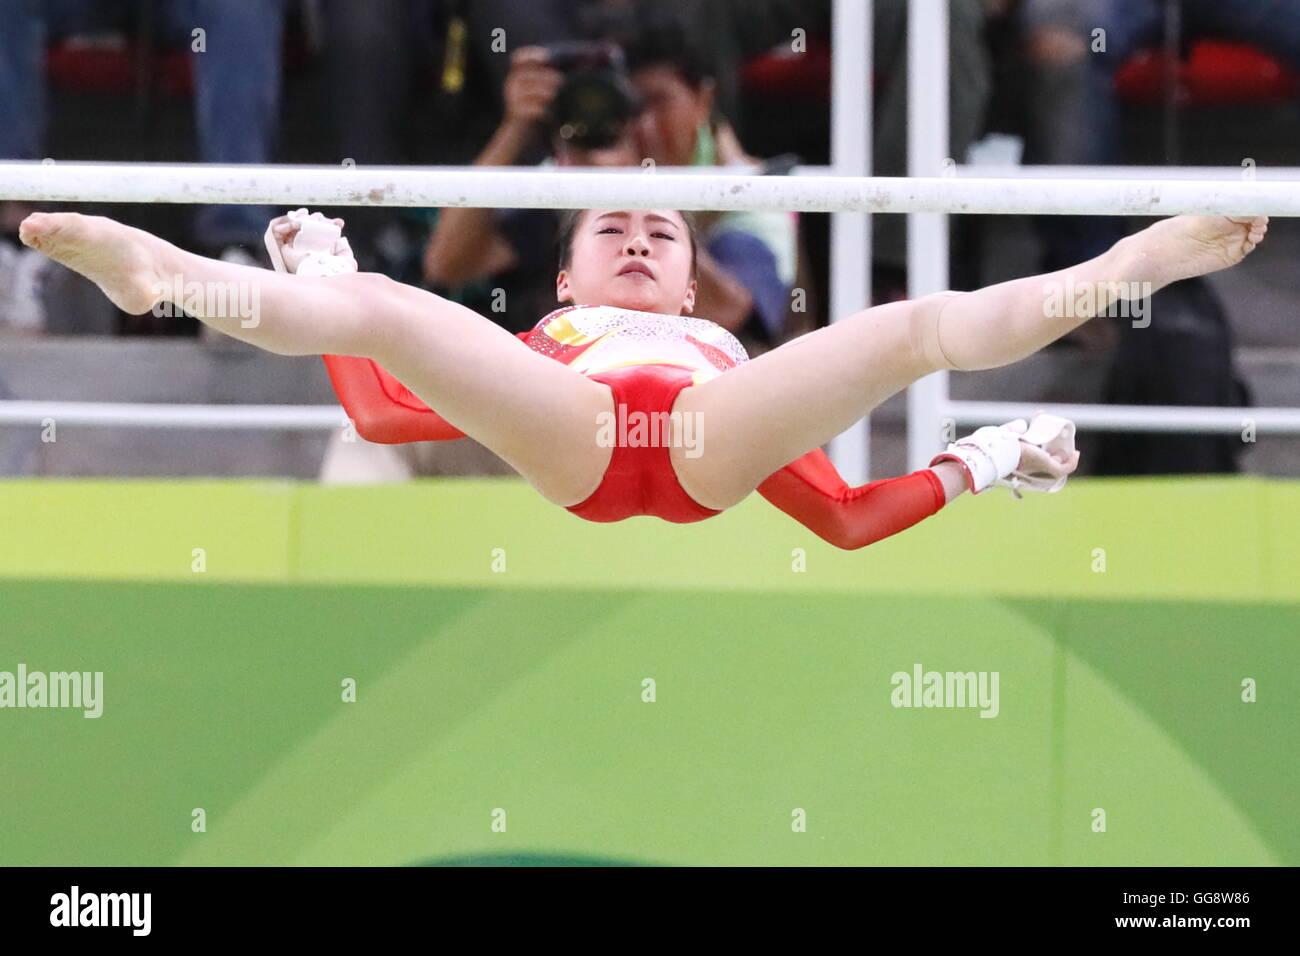 Rio de Janeiro, Brésil. 9 Août, 2016. Sugihara Aiko (JPN) Gymnastique artistique: la finale des Photo Stock